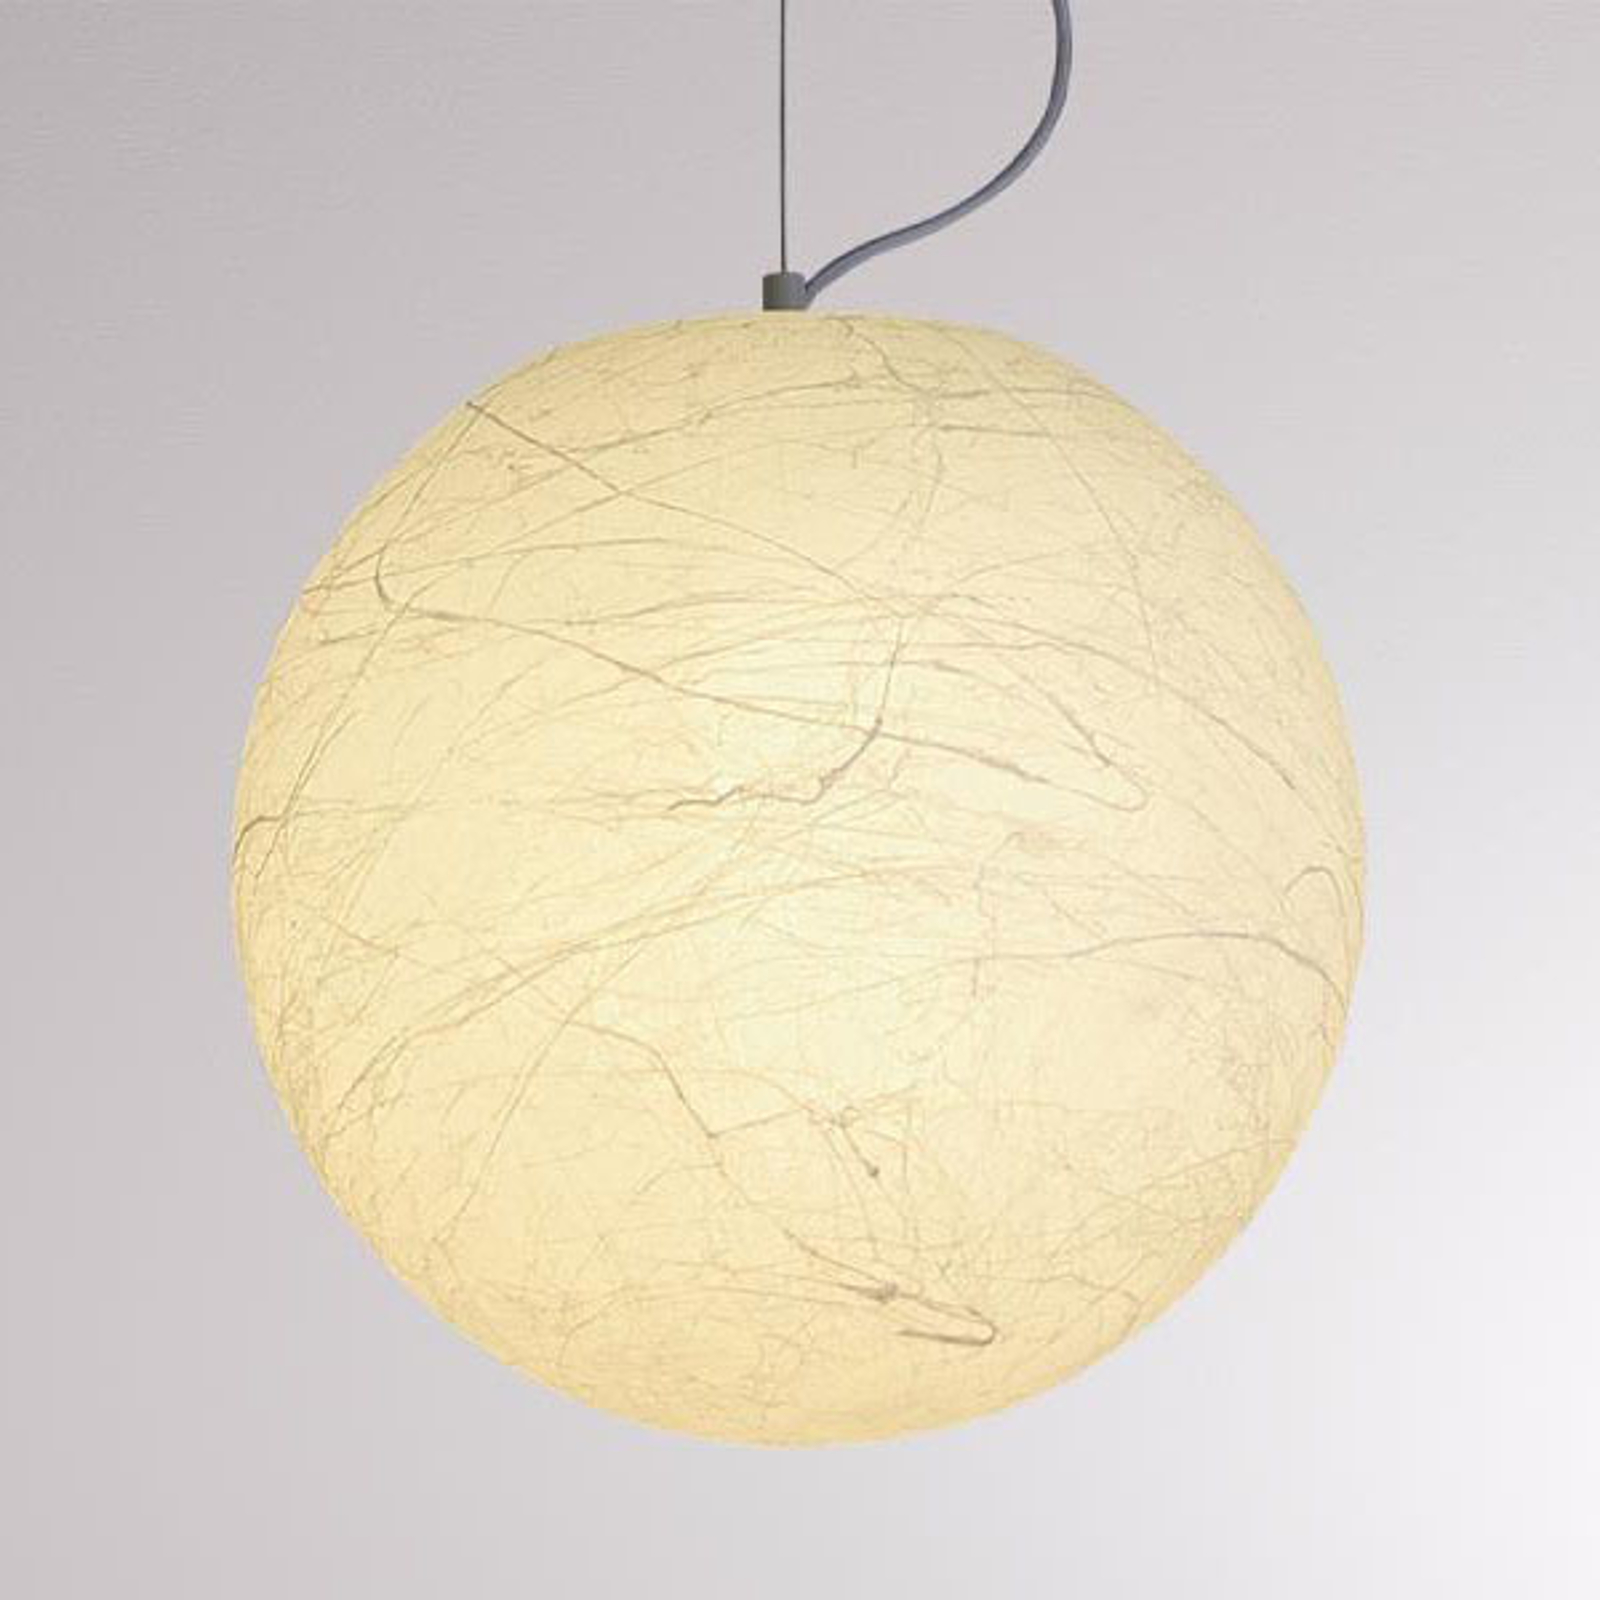 LOUM Diovis hanglamp Ø 60 cm